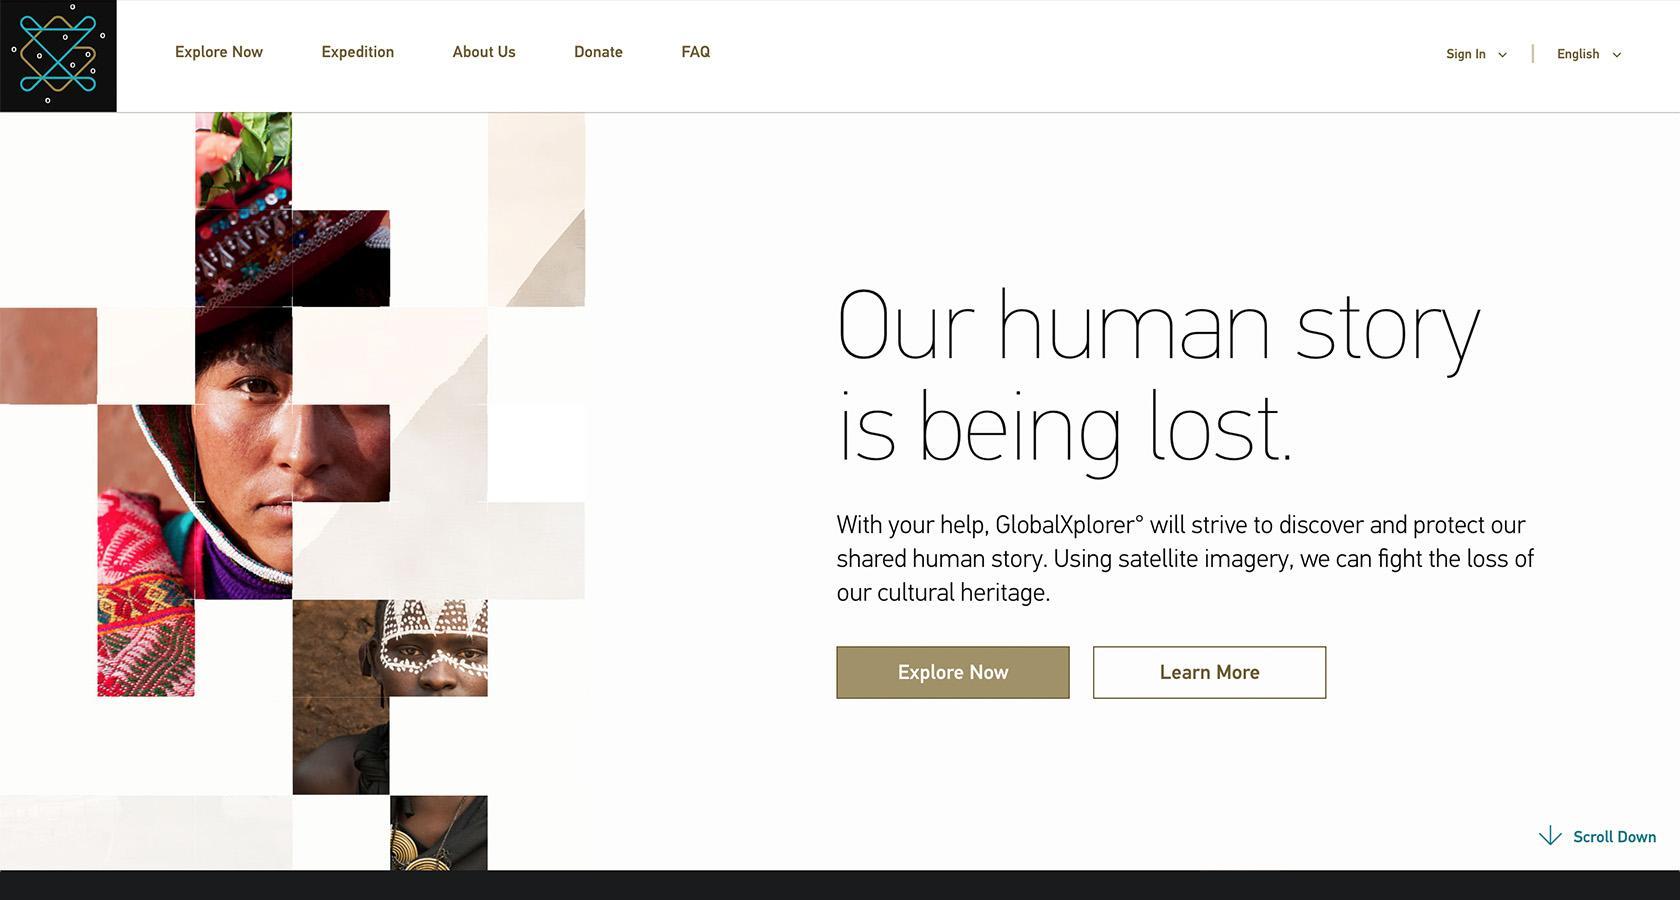 Creative copy interface design